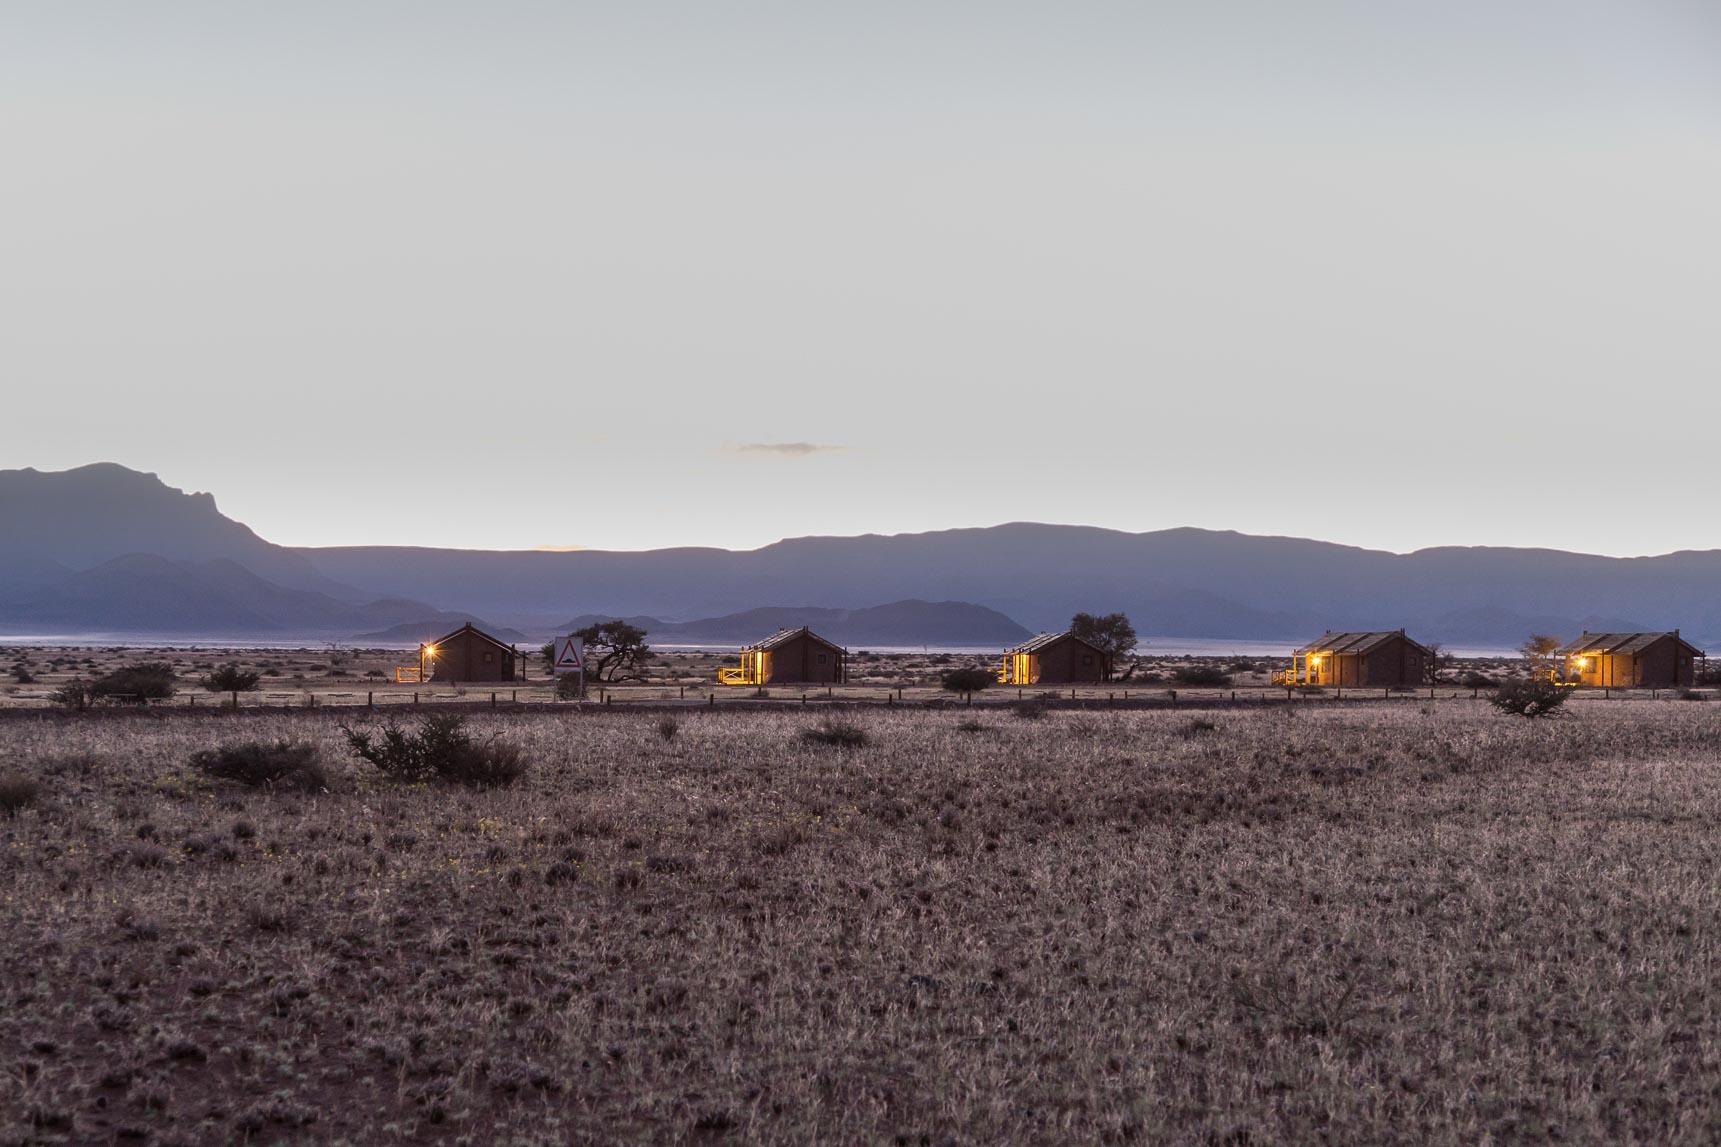 Desert-Camp-Namibia-63